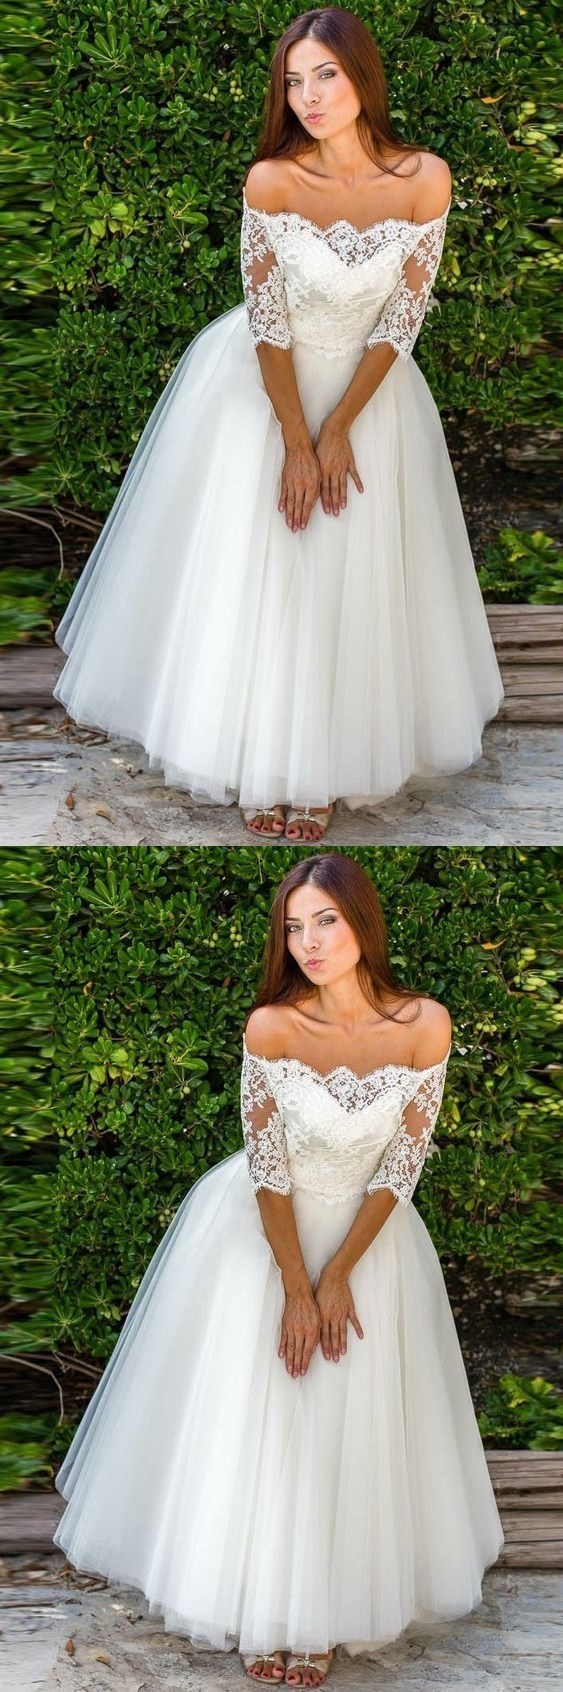 Elegant Half Sleeve Tulle Lace Wedding Dress Bridal Gown